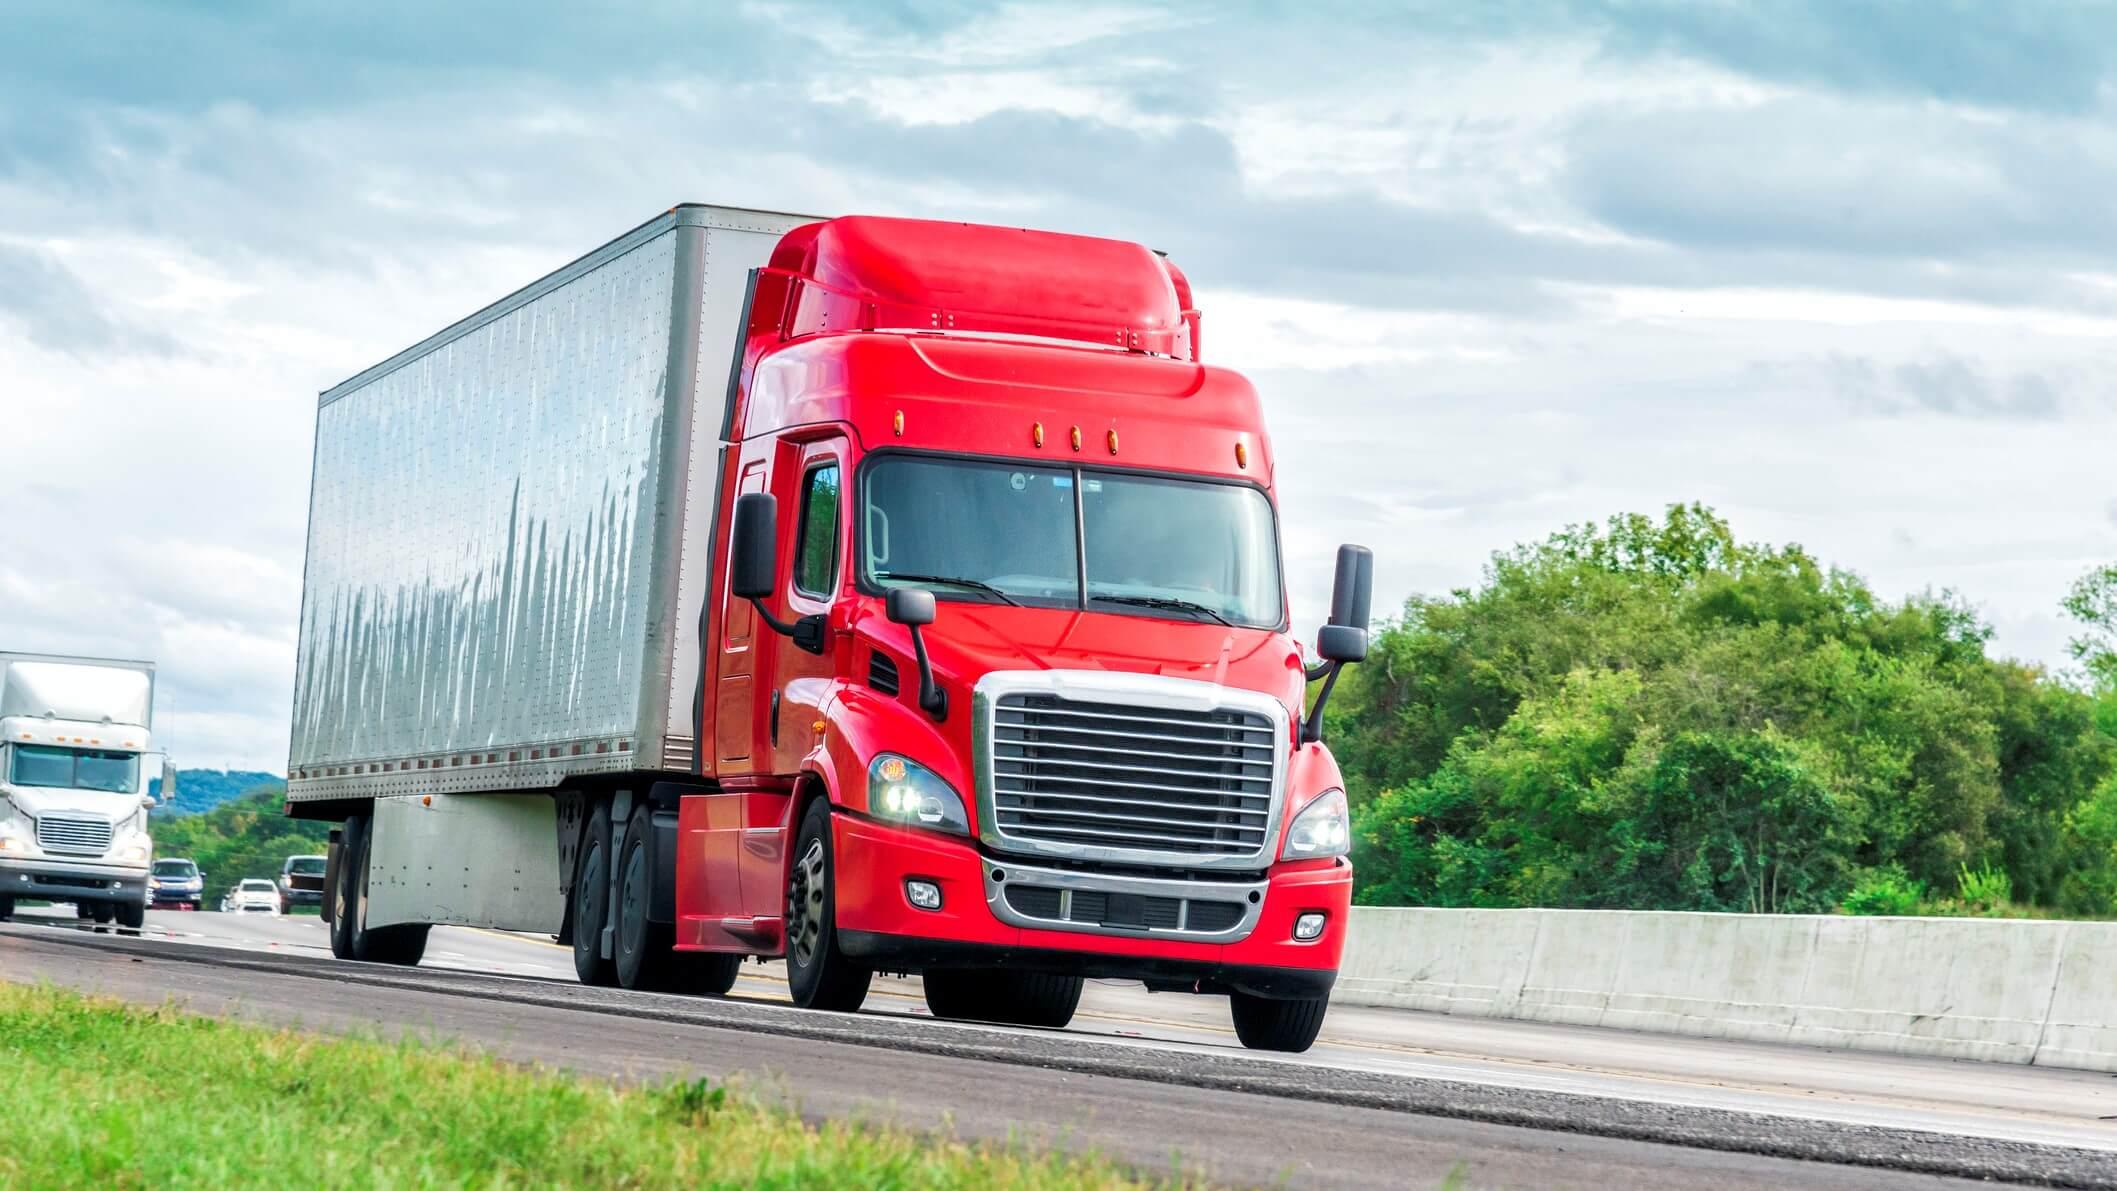 Texas California Truck Insurance